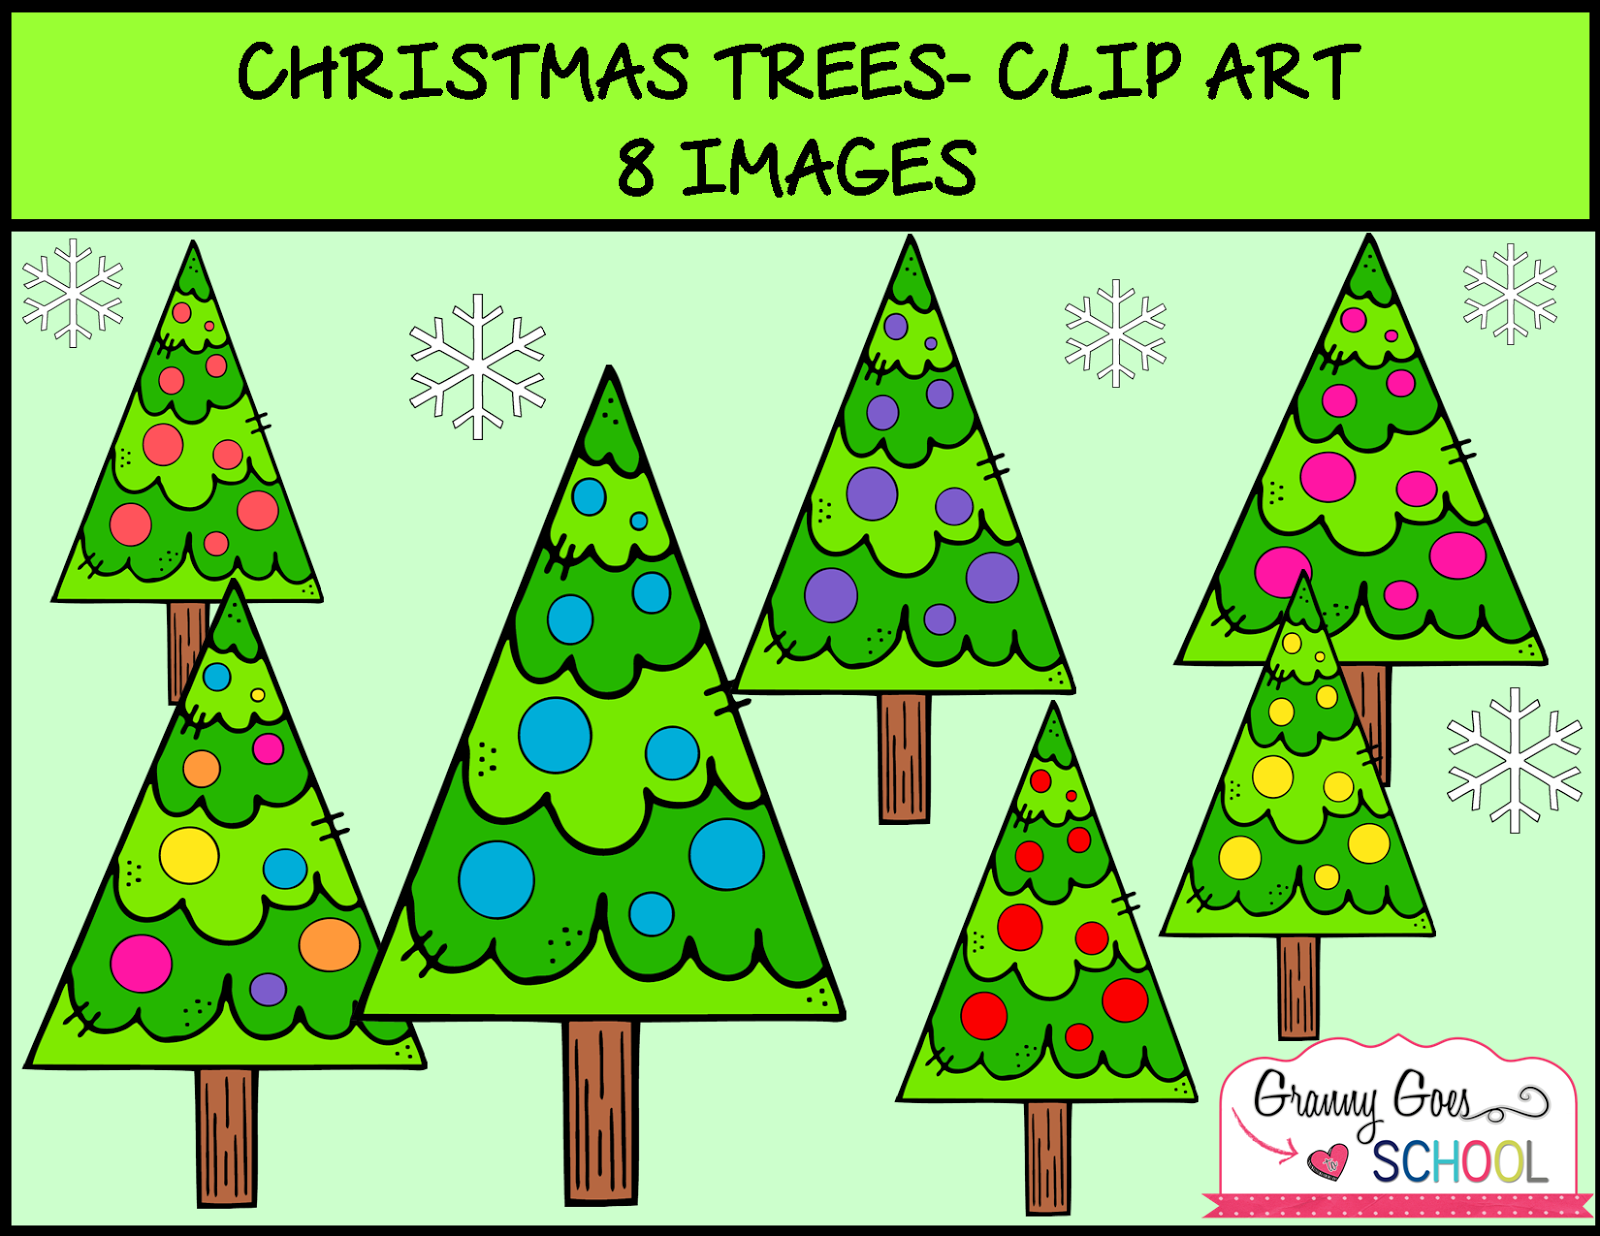 http://1.bp.blogspot.com/-cpqjPTNuG4o/VH1C095UDRI/AAAAAAAAH6o/dx3cxxHaLLM/s1600/12days.tree.aa.TpT.png